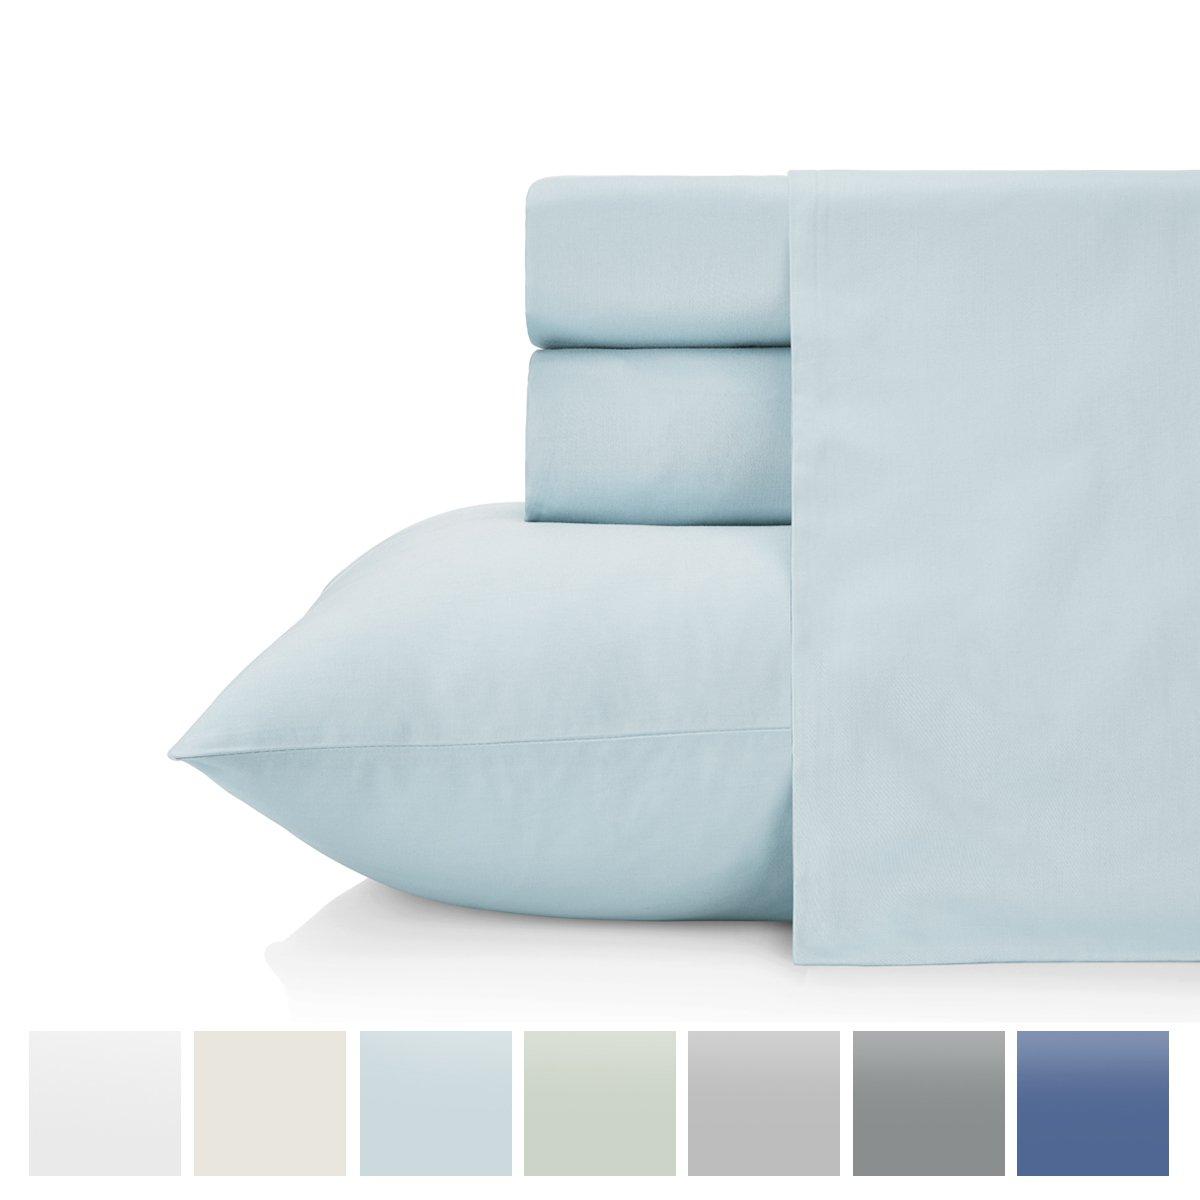 KRISTEX Ultrasoft 800 Thread Count 4 Piece Sheet Set, Soft & Silky Sateen Weave, Elegant & Classic Luxury Bedding Set, Deep Pocket, Cozy, Comfortable King 78''x80'' Spa Blue